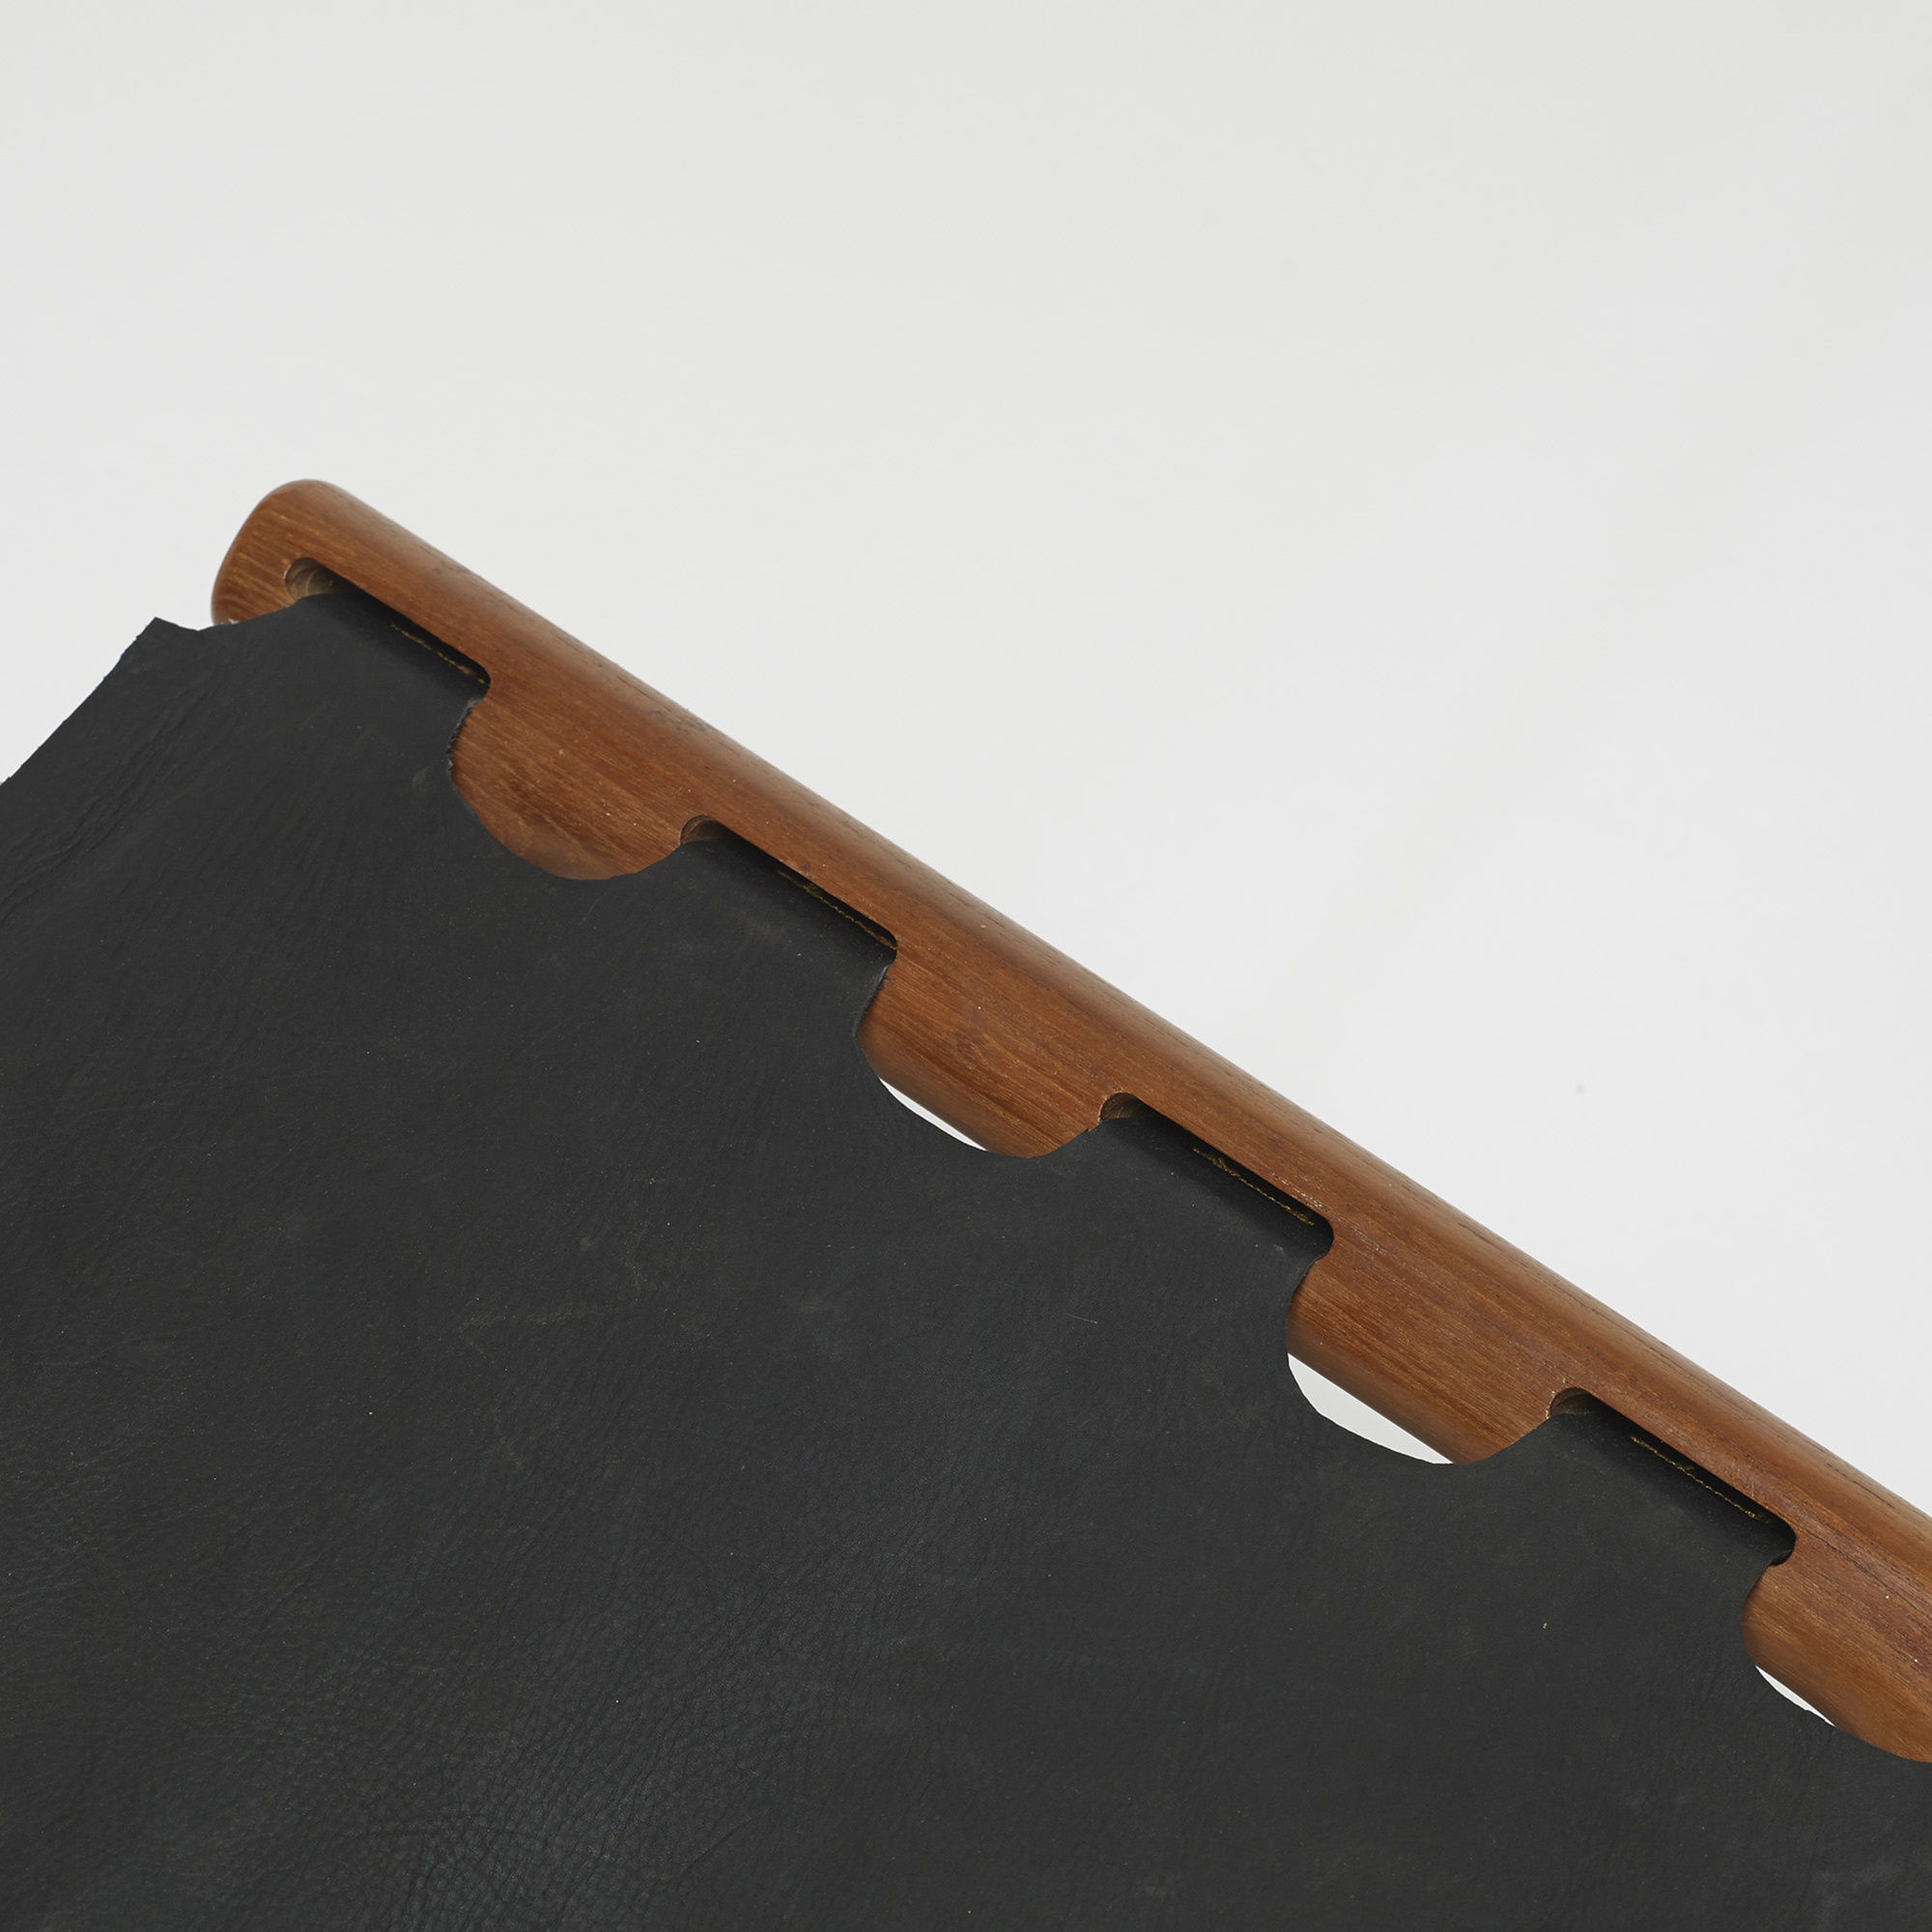 362: Poul Hundevad / Guldhoj folding stool (3 of 3)